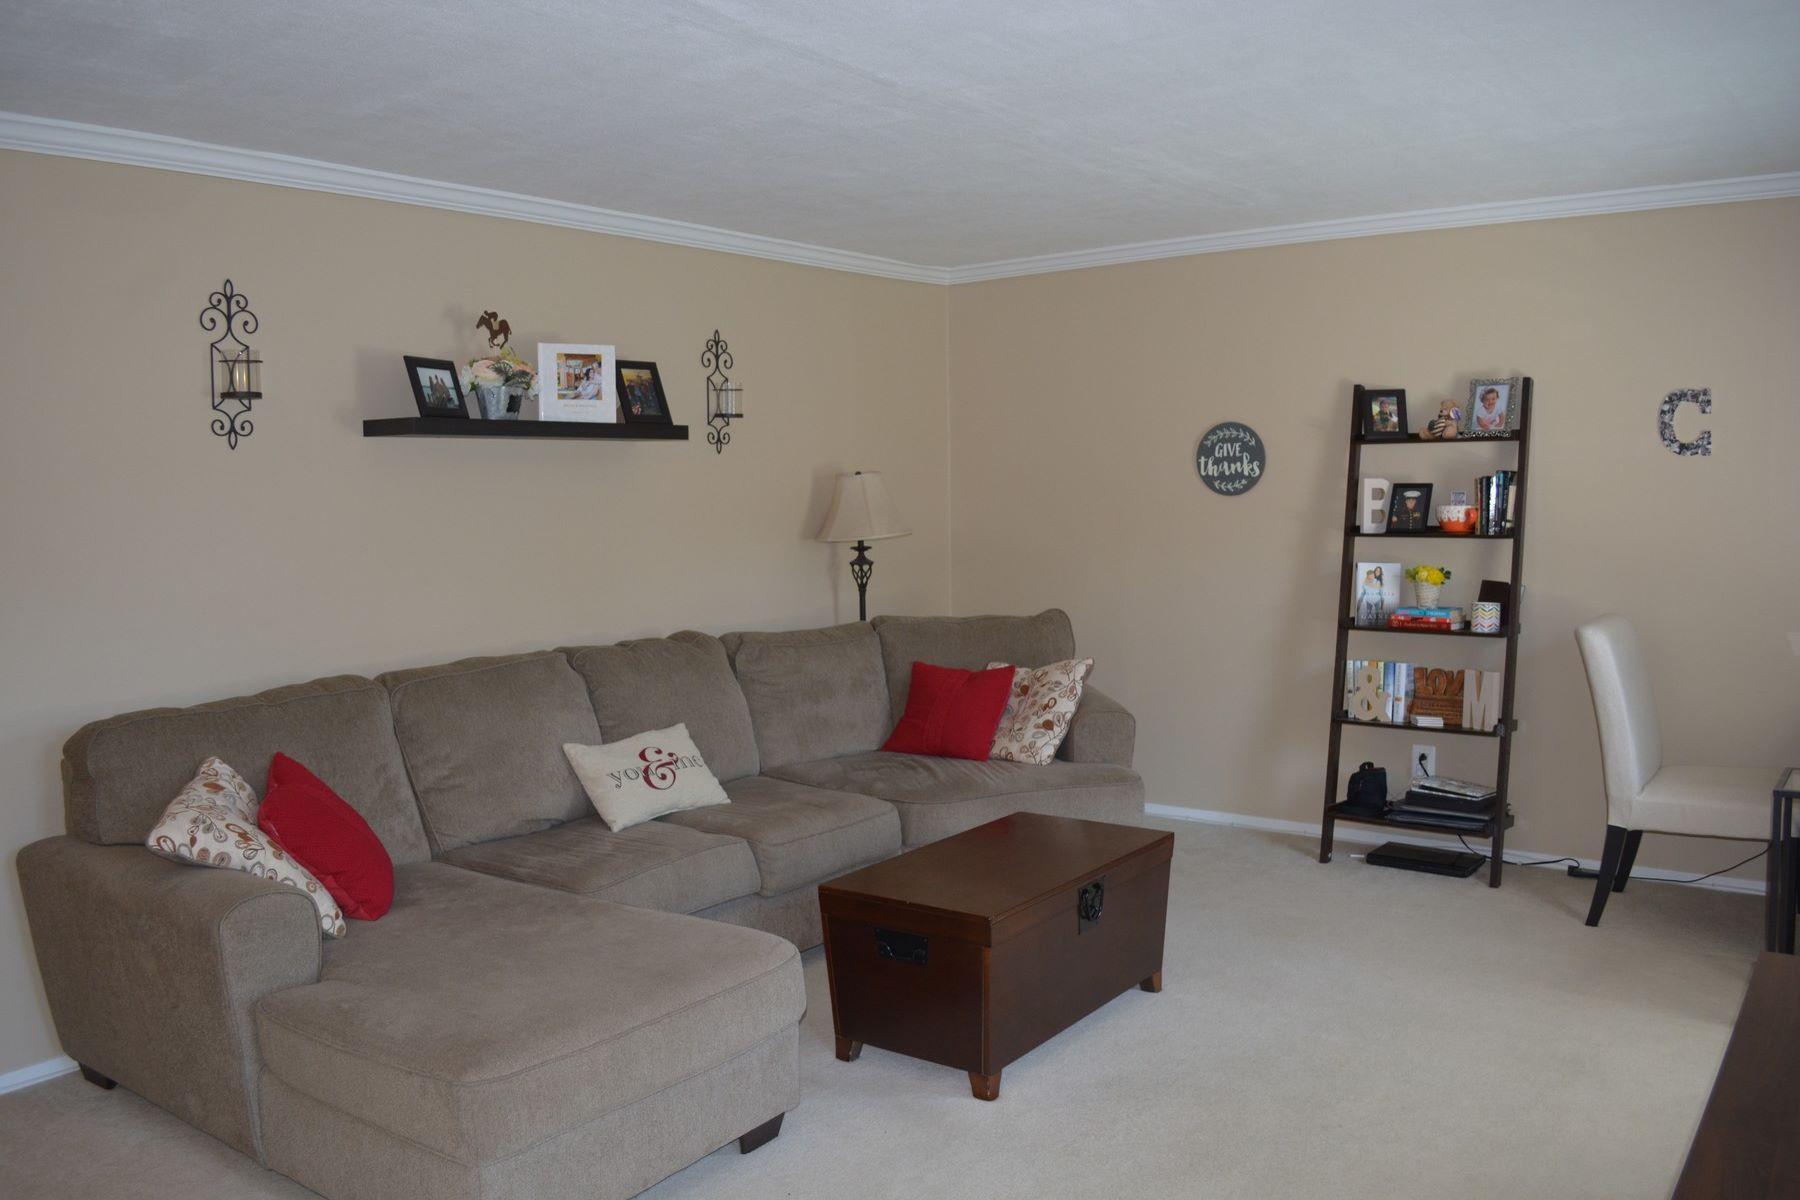 Condominium for Rent at Charming Apartment 132 Claremont Road Unit 7D Bernardsville, New Jersey, 07924 United States